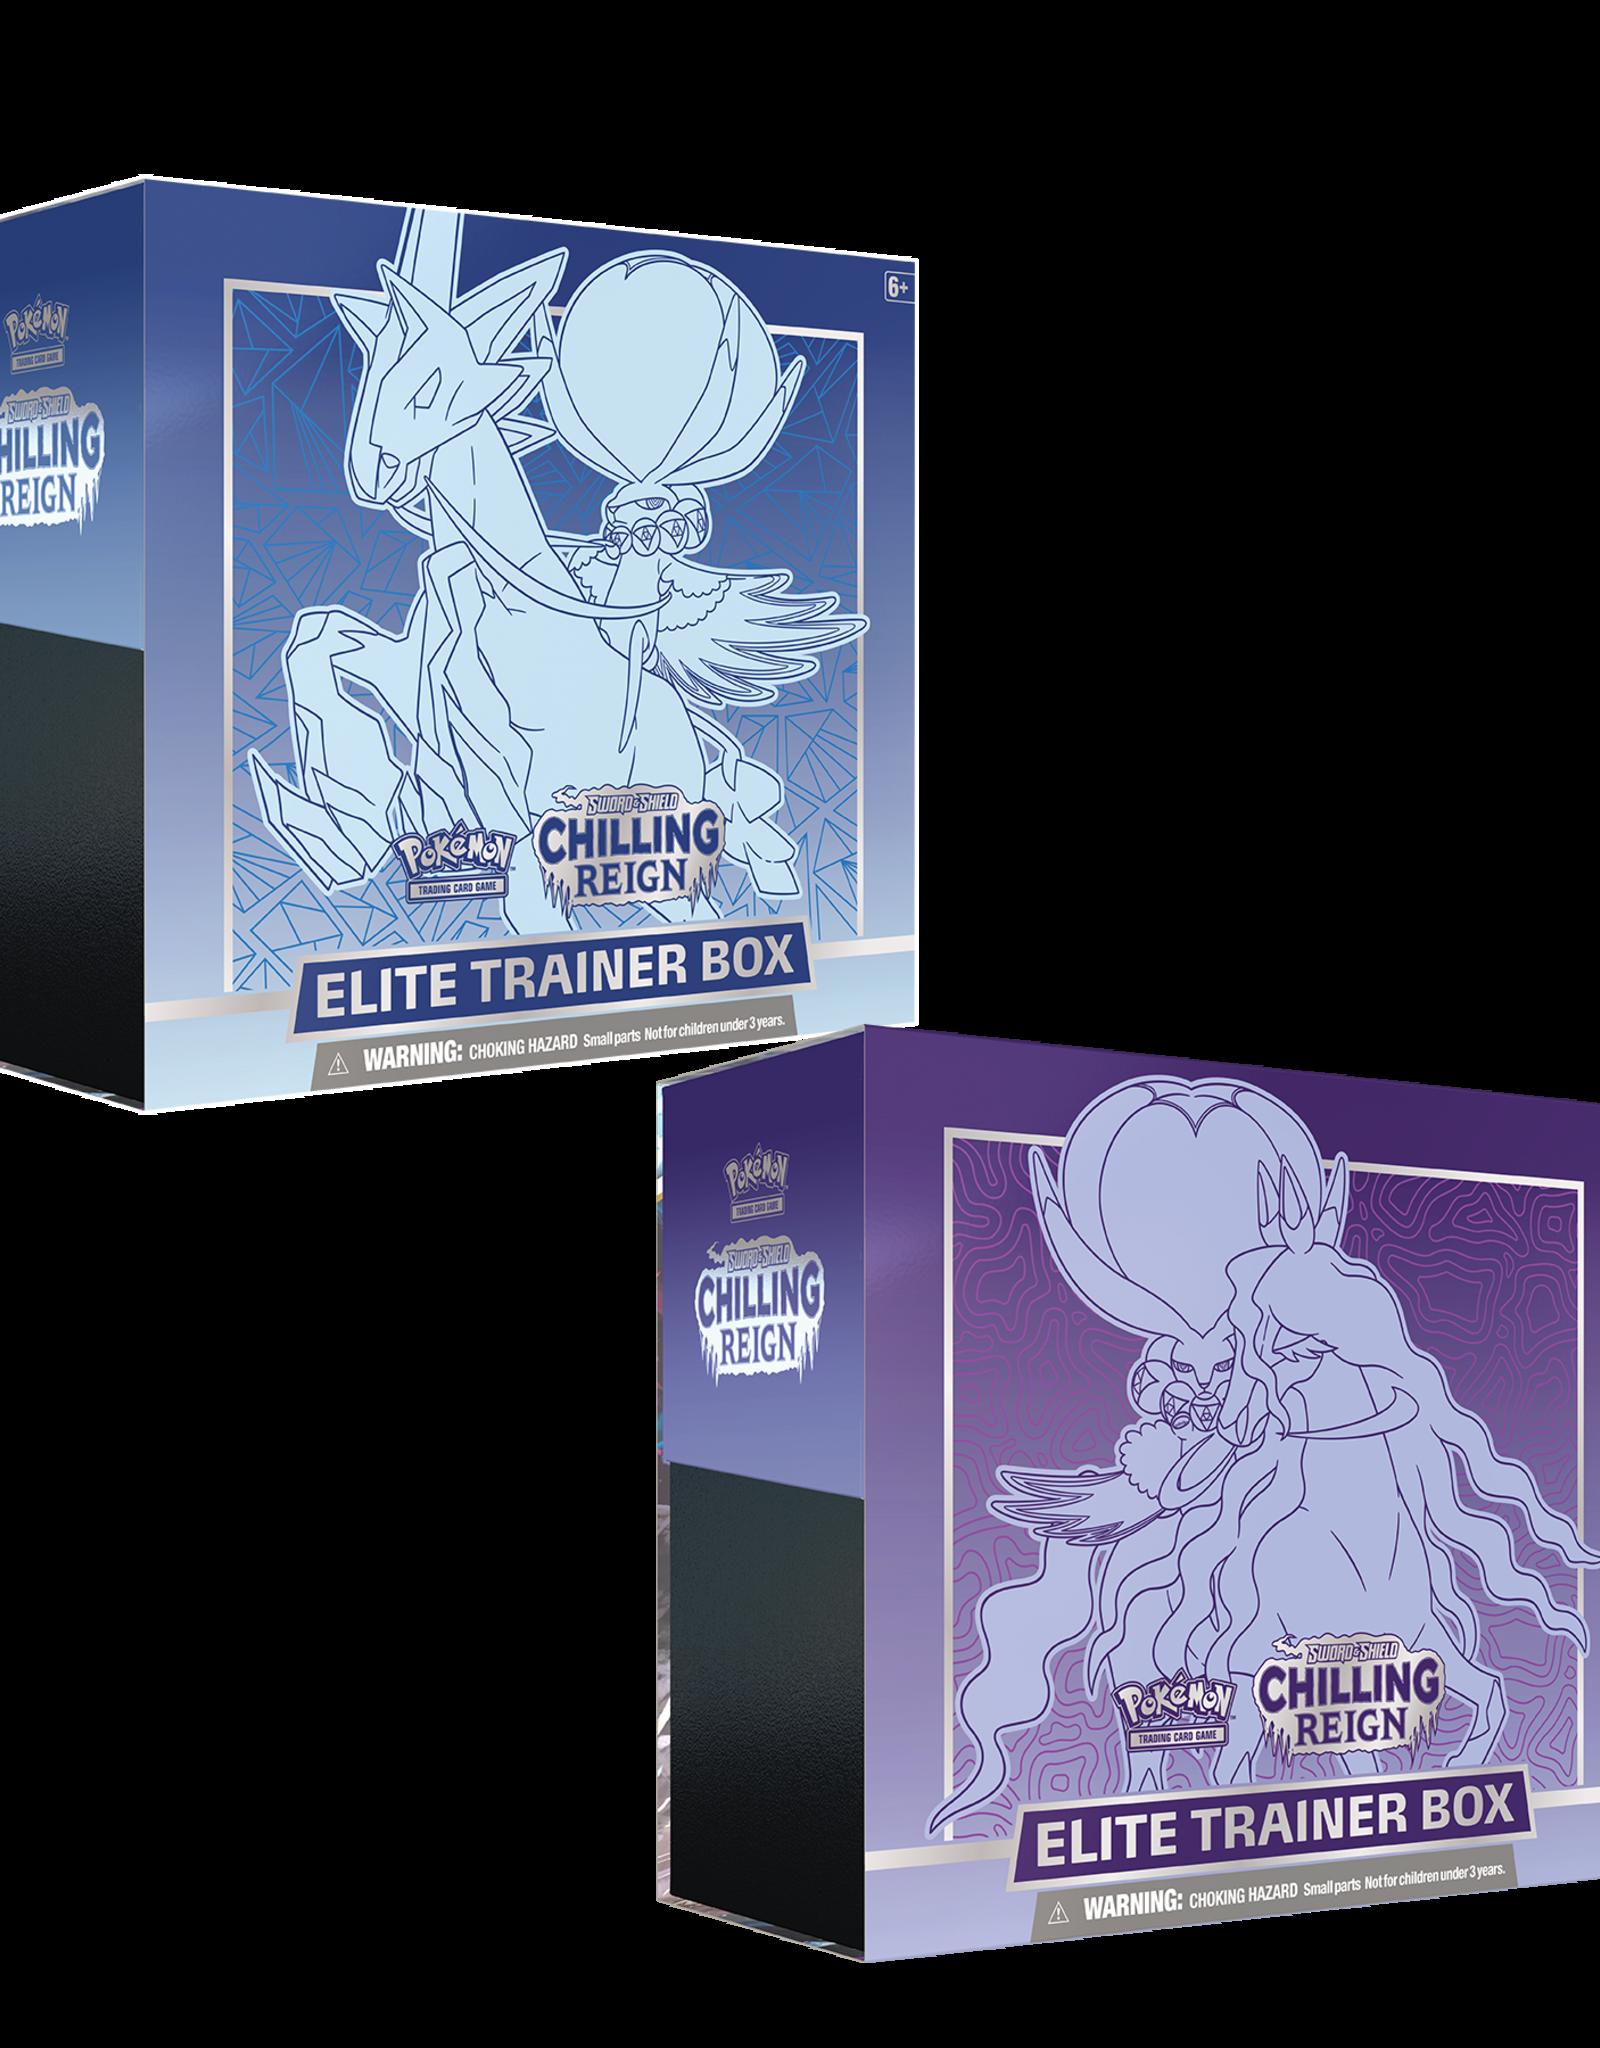 Pokemon Pokemon Chilling Reign Elite Trainer Box